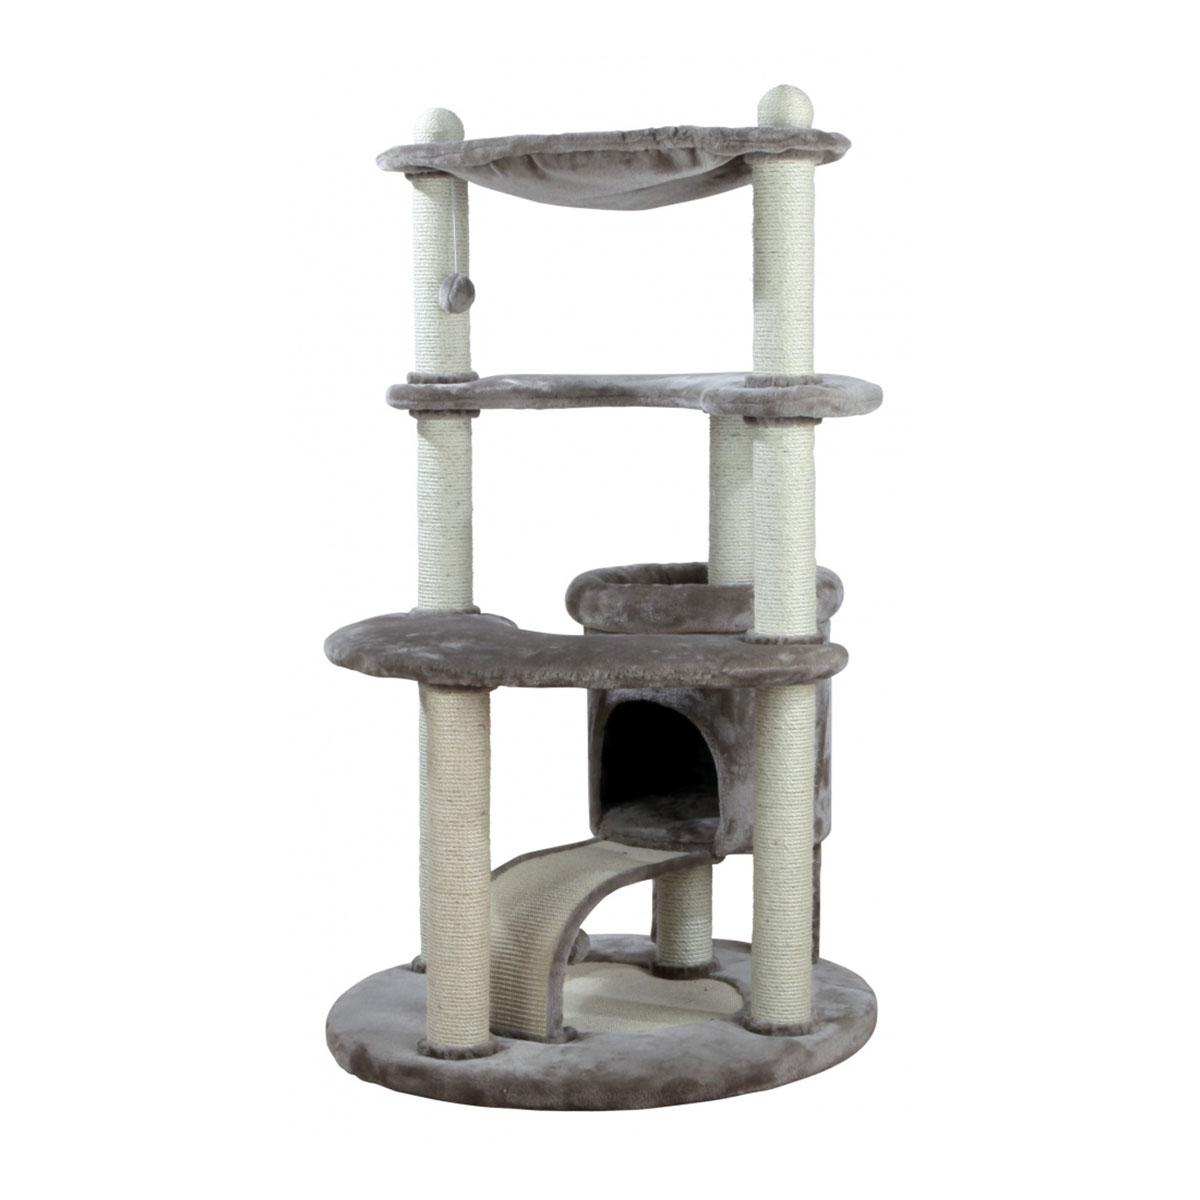 trixie kratzbaum patricia 140cm silbergrau katzenbaum. Black Bedroom Furniture Sets. Home Design Ideas